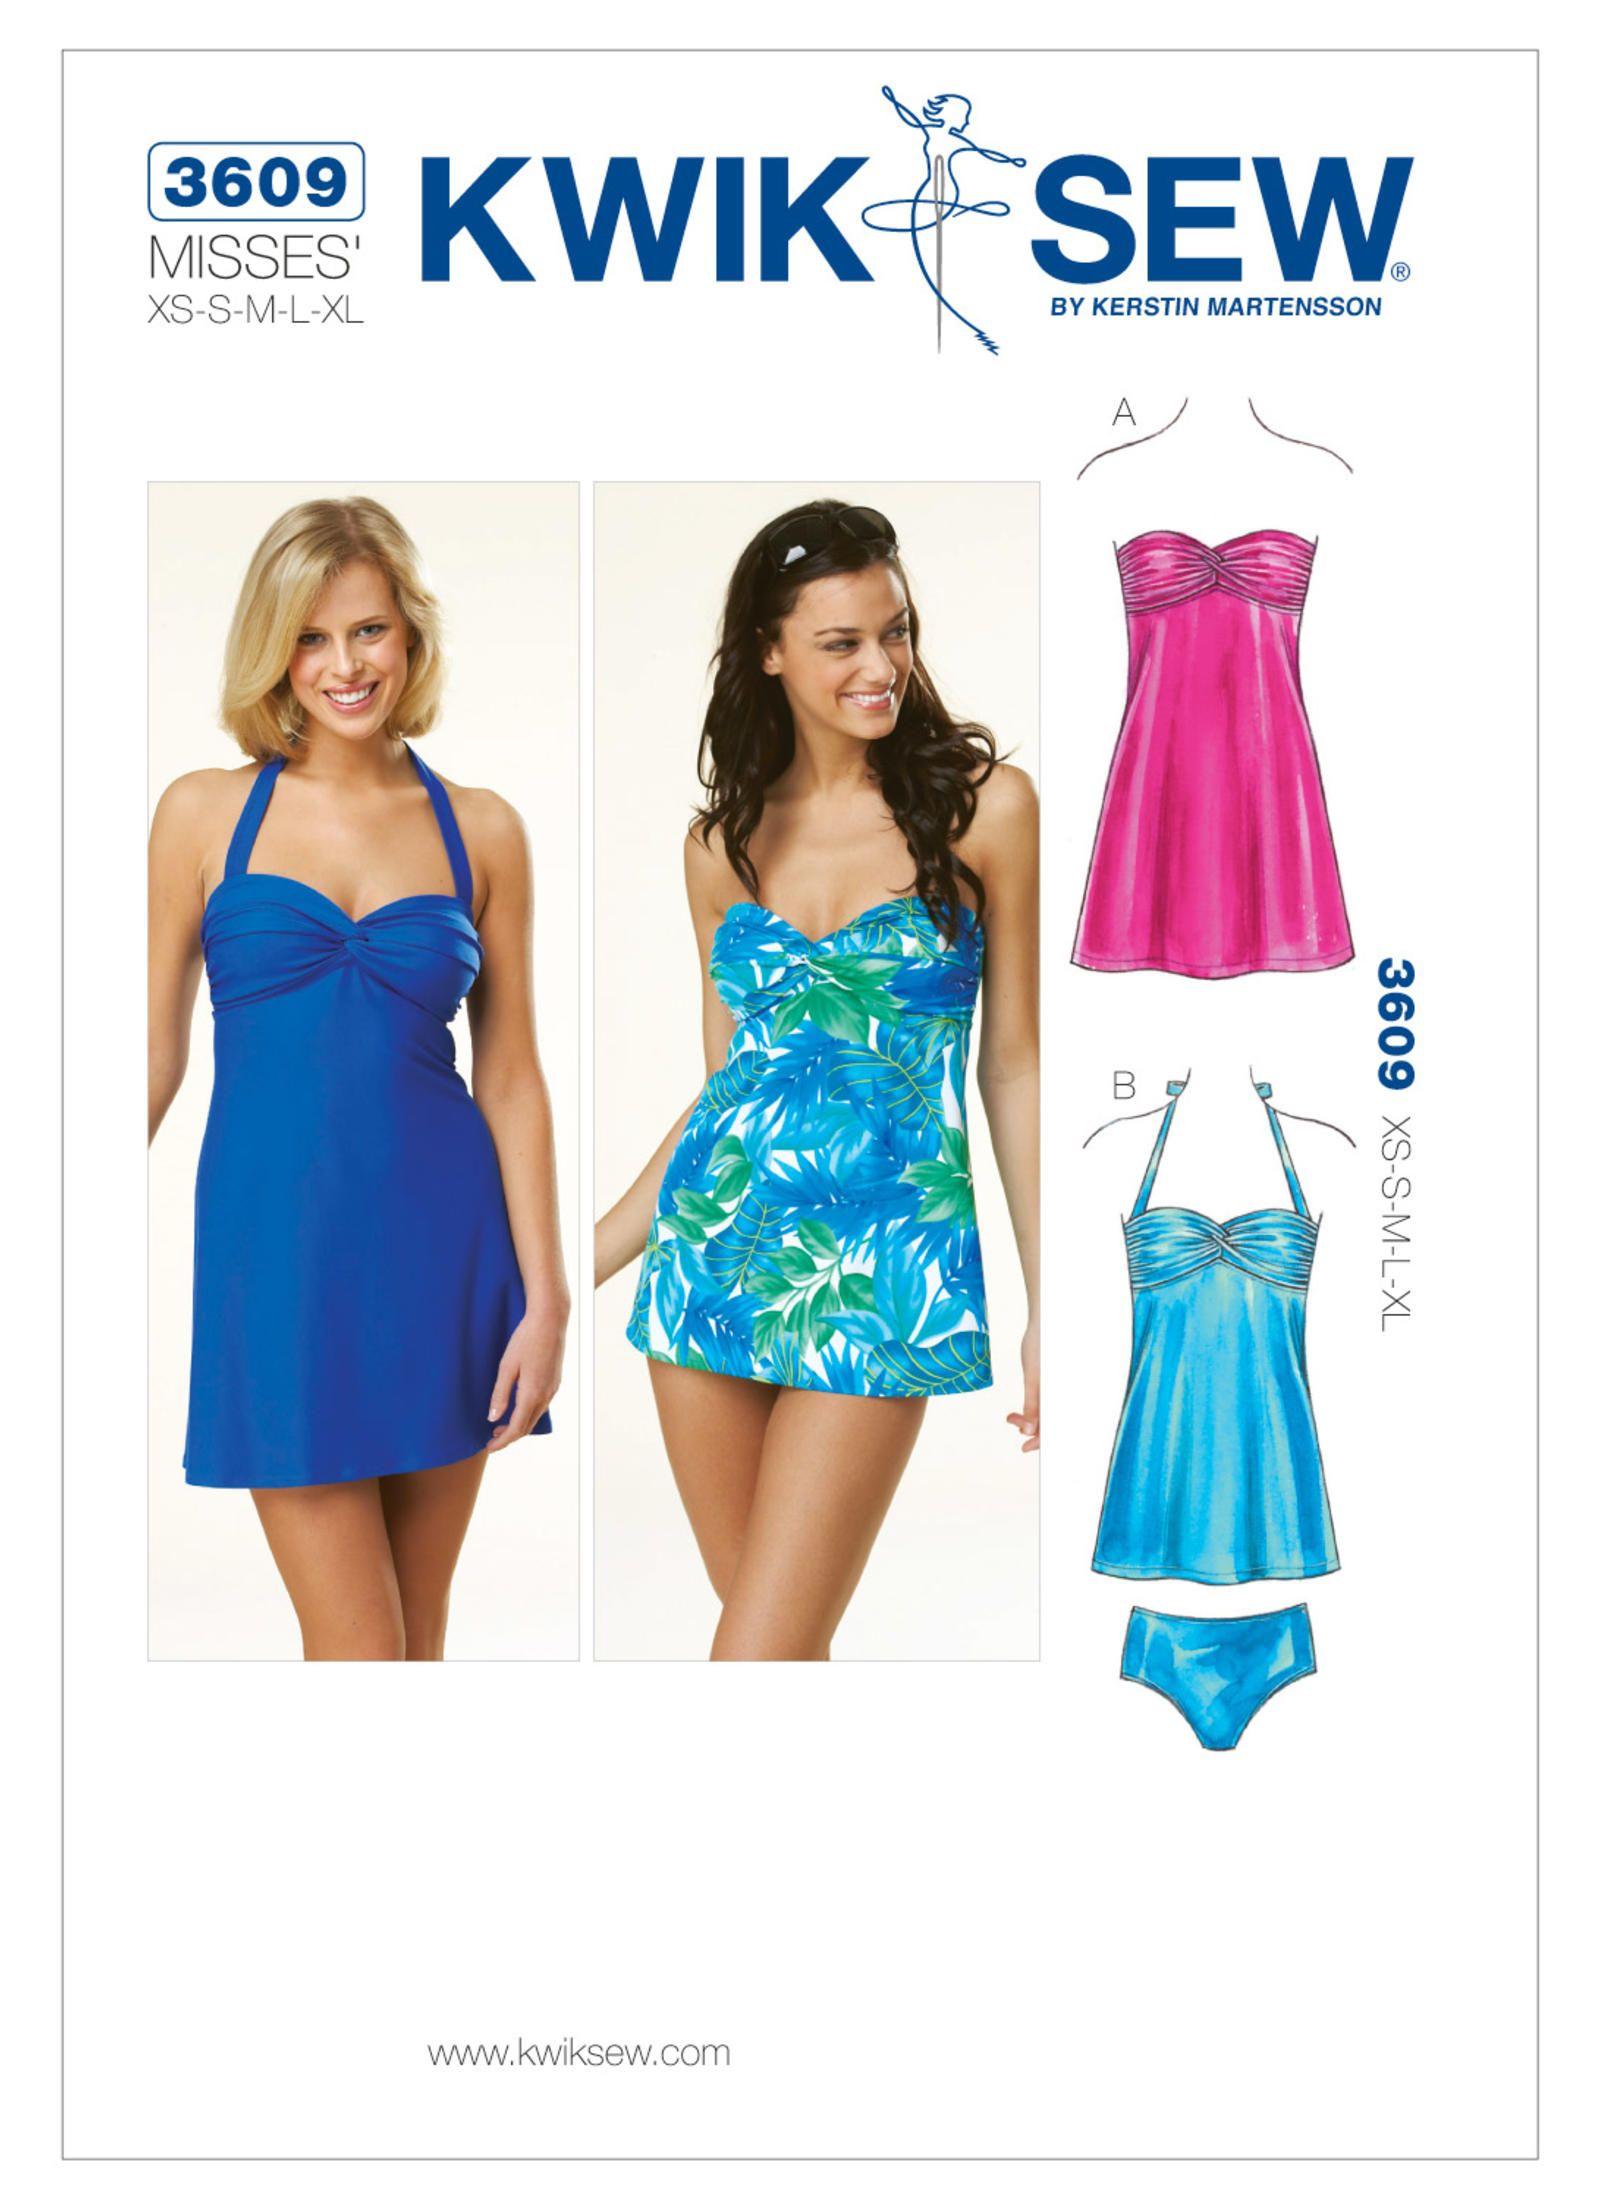 287fb4a7c47da Swimdress/tankini swimsuit sewing pattern. K3609 | Kwik Sew Patterns ...